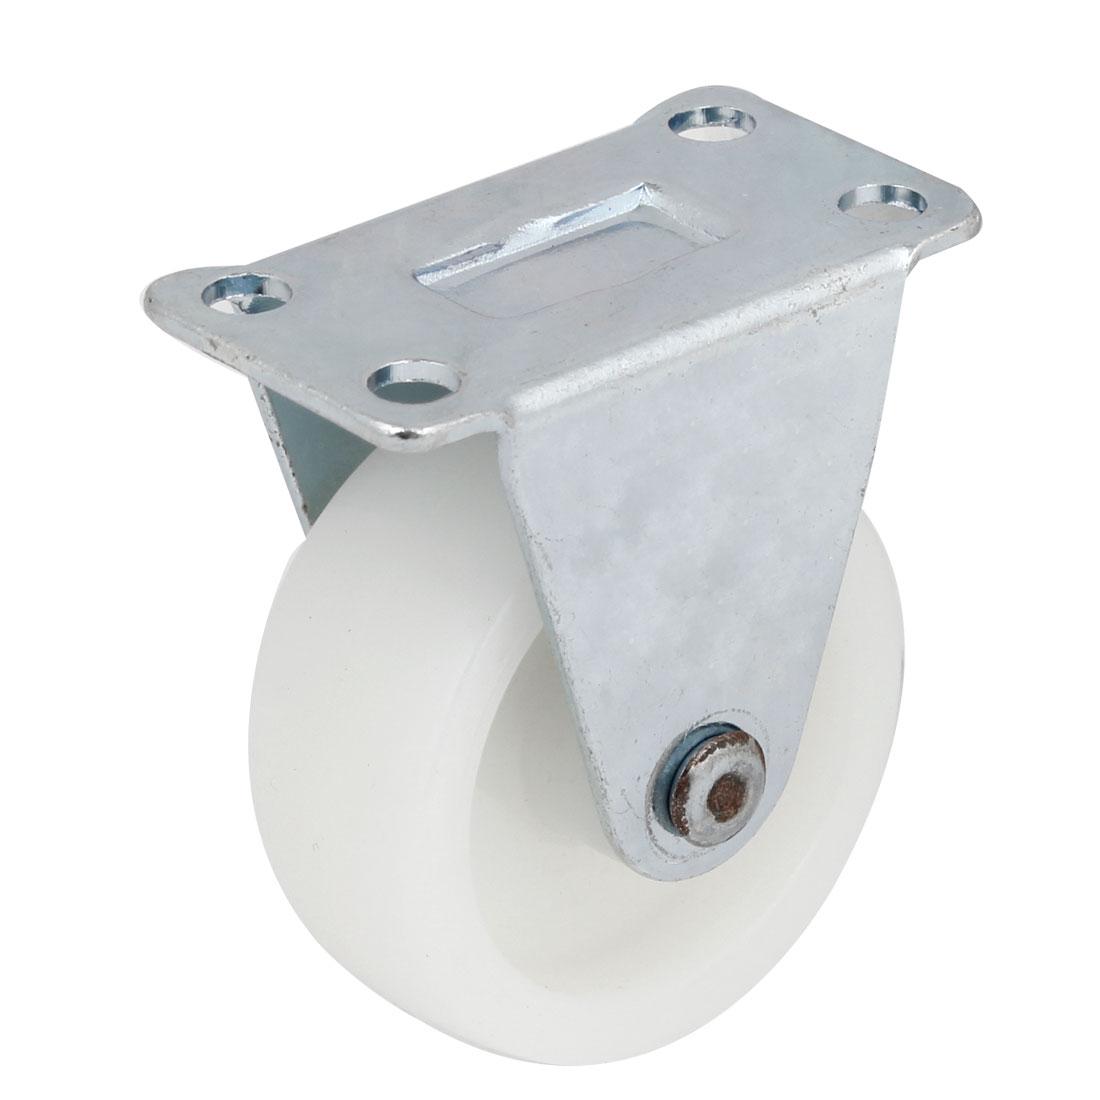 "1.6"" Diameter Plastic White Single Wheel Metal Rotatable Flat Plate Caster"